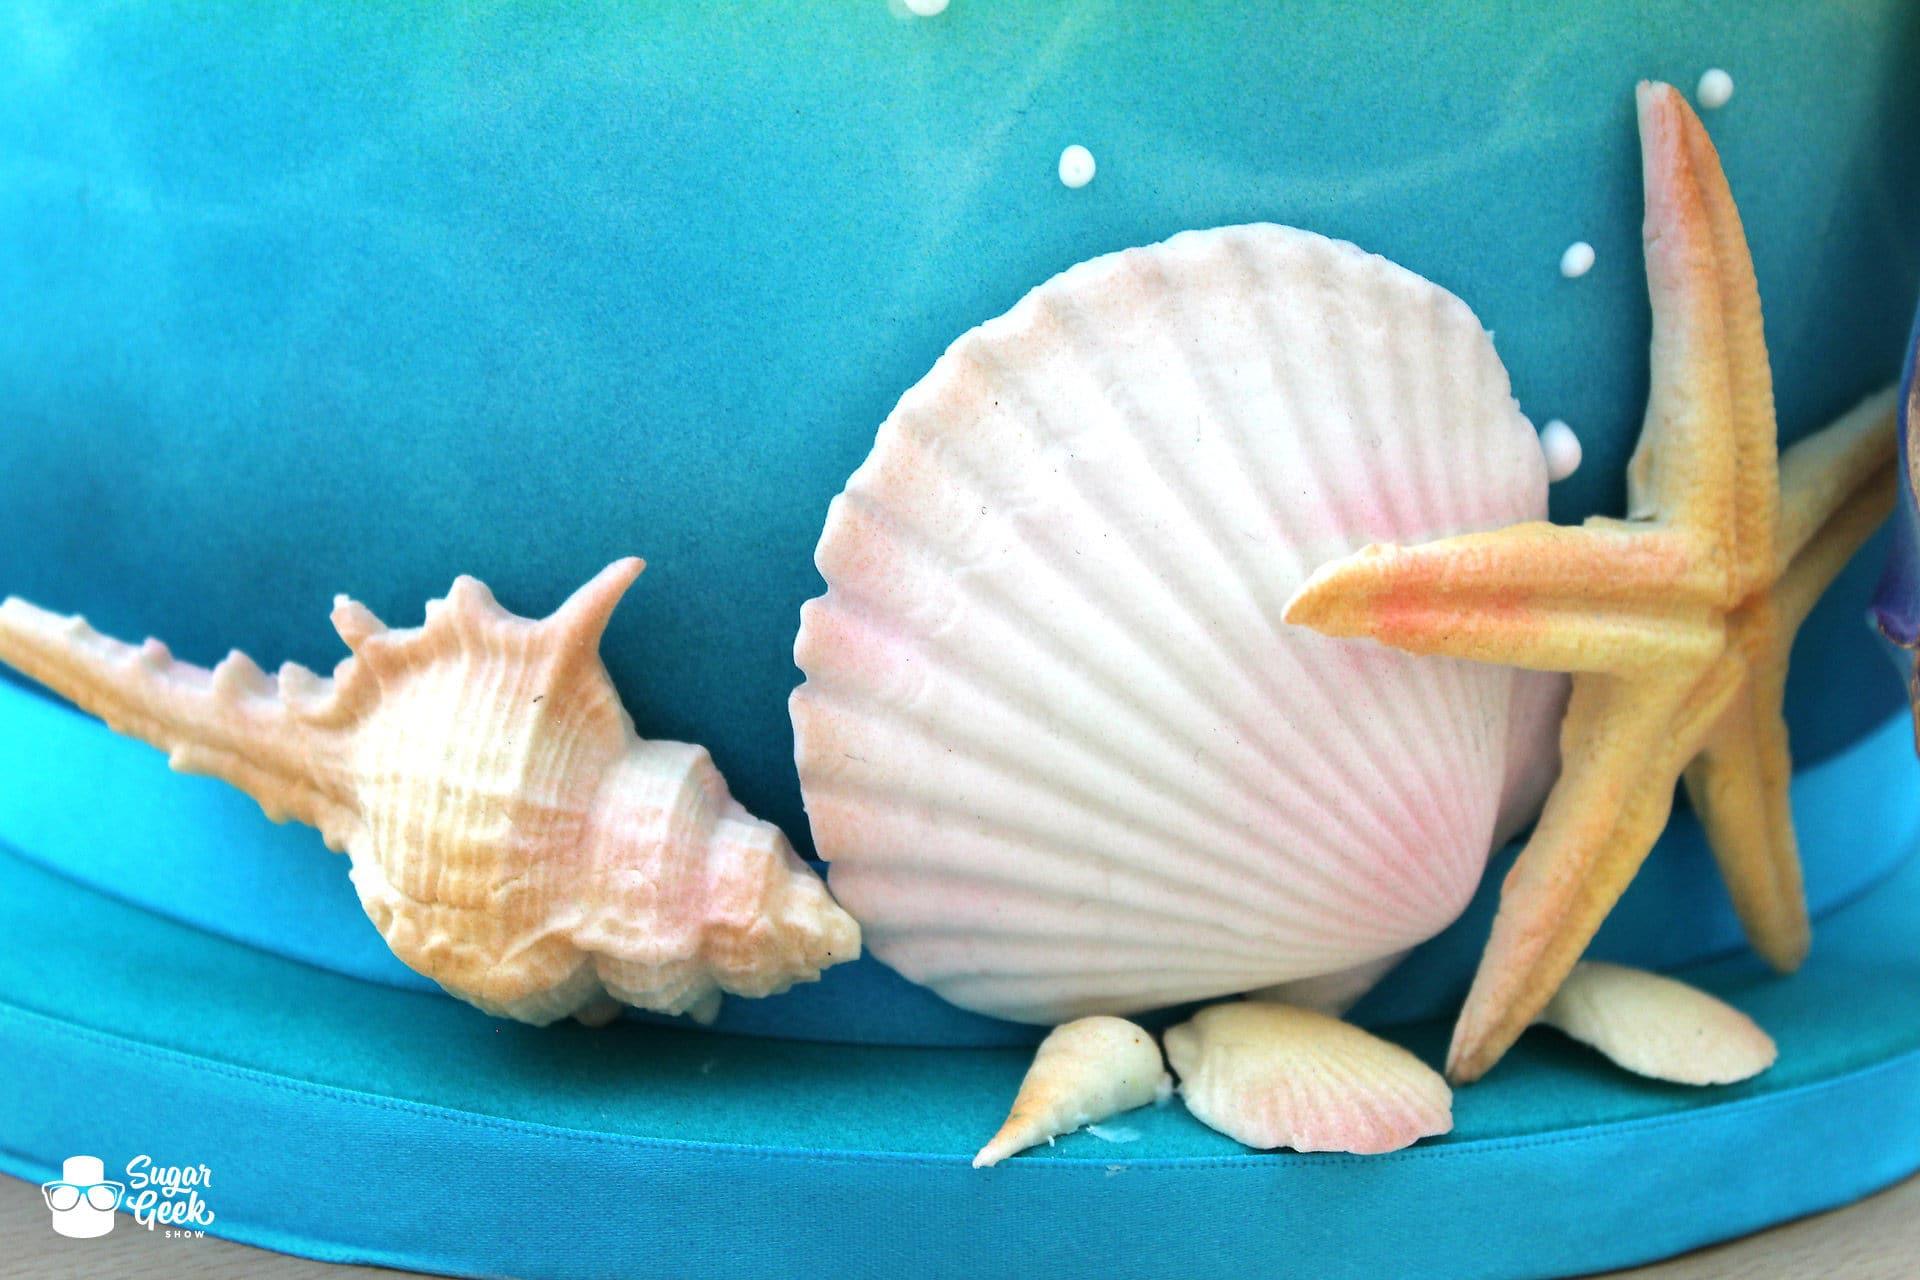 Edible Shells Airbrushed